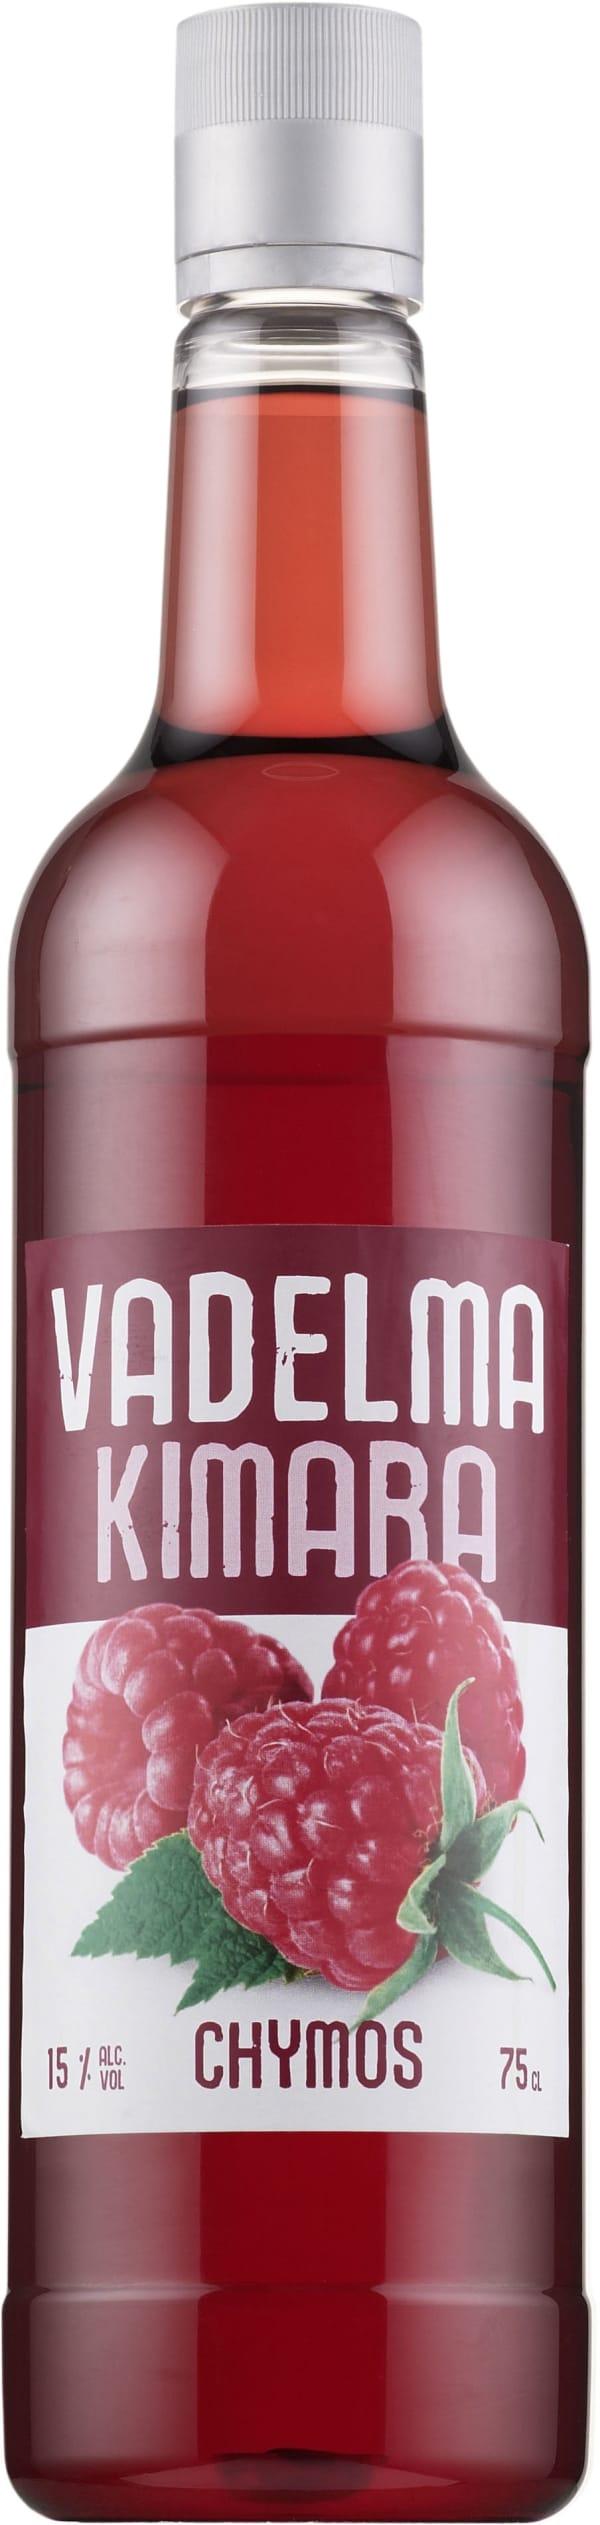 Chymos Vadelma Kimara  plastic bottle